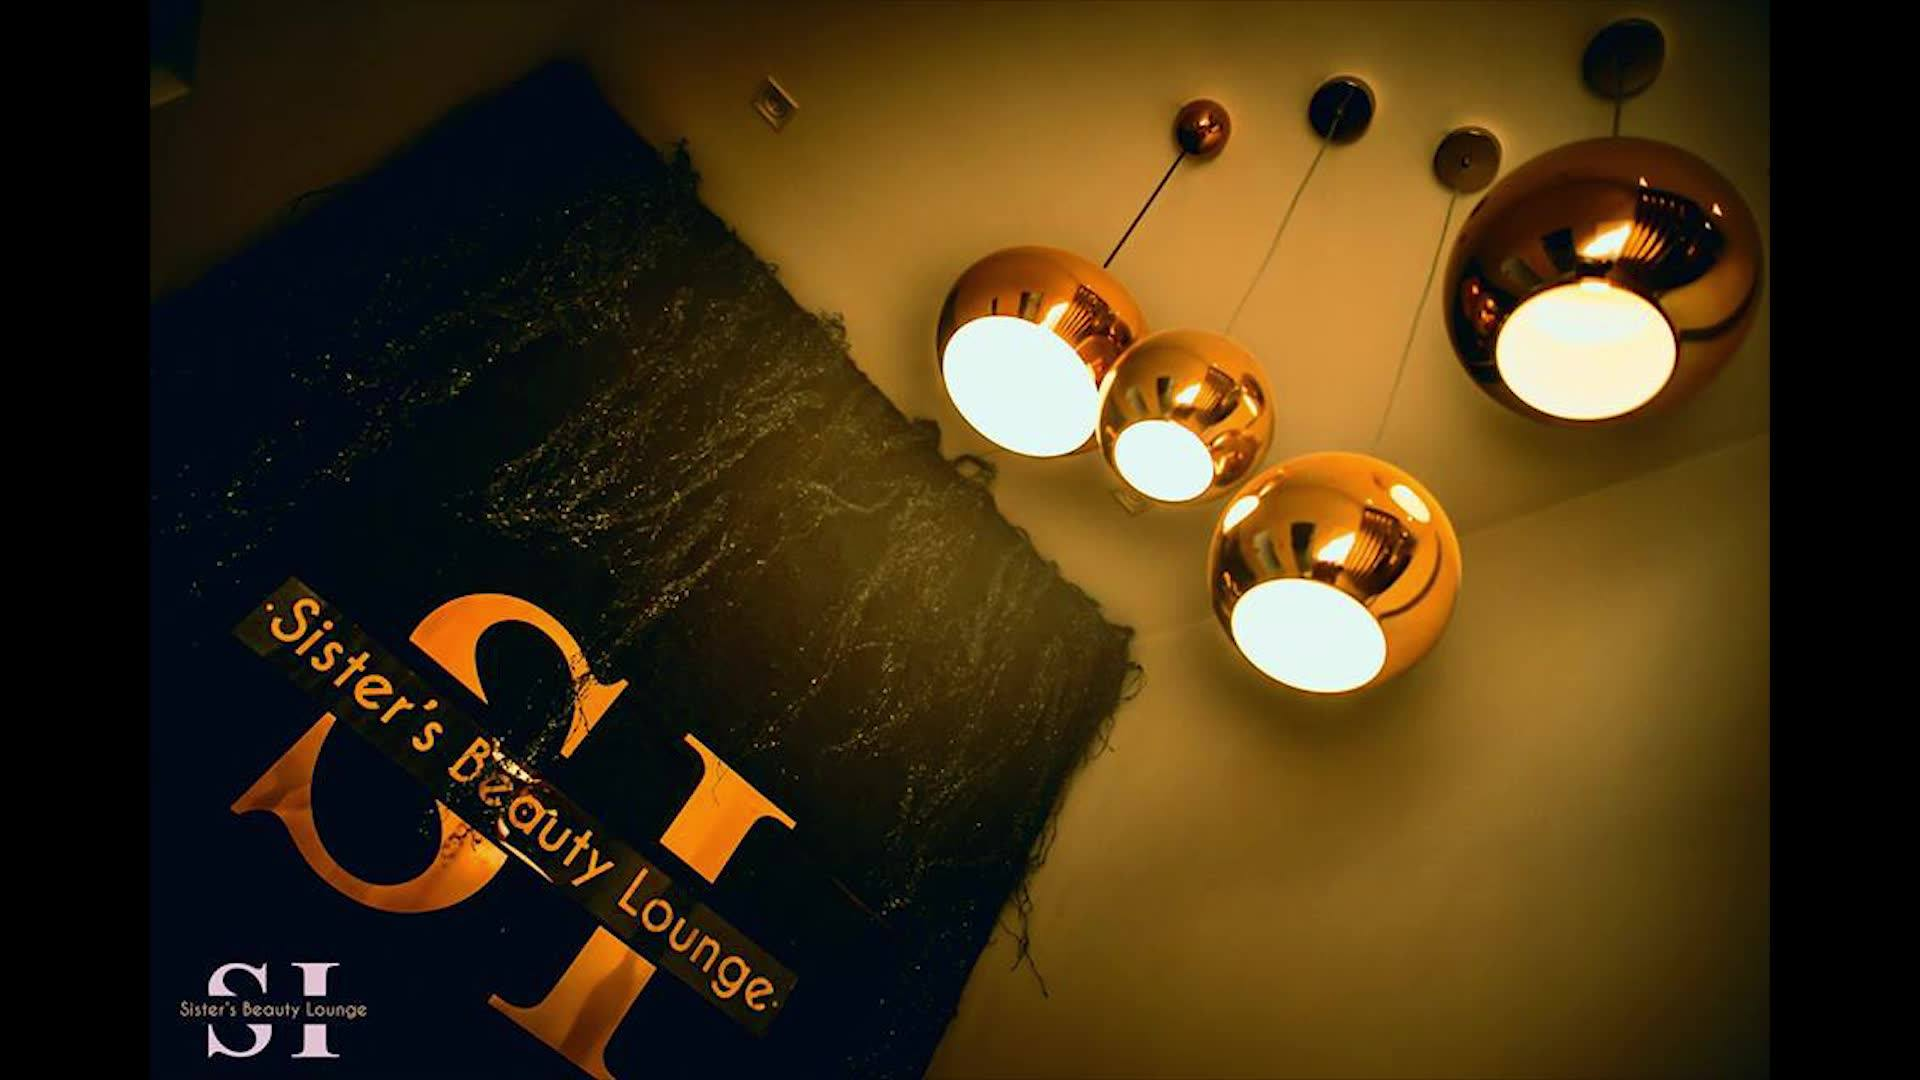 Sister's Beauty Lounge by Ichraf & Sonda